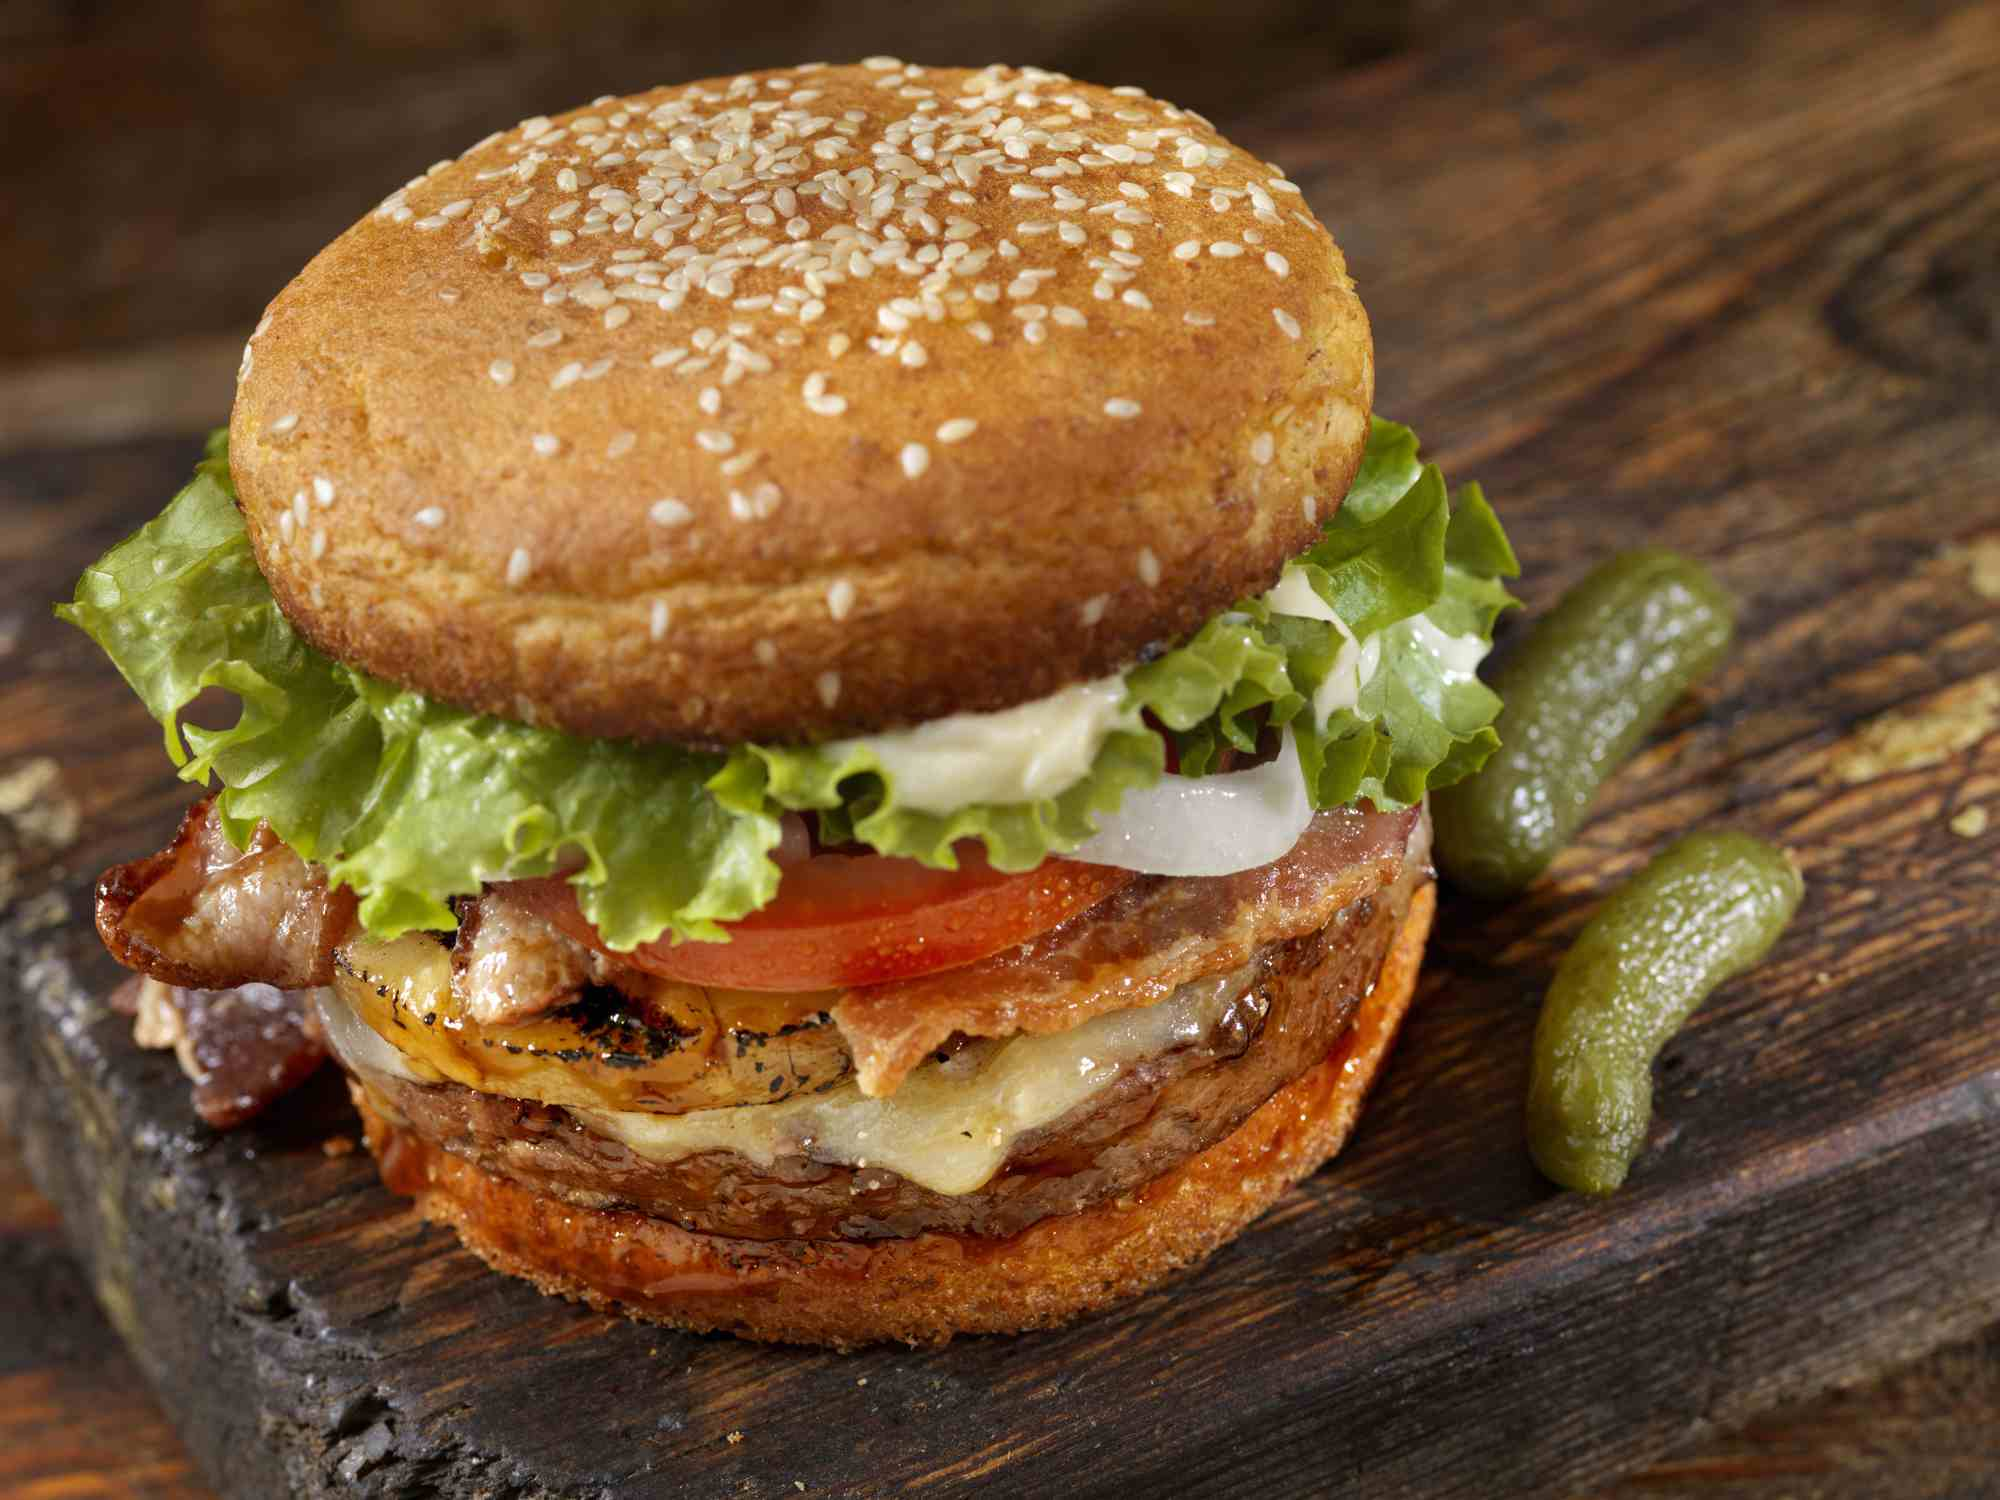 Bacon burger on cutting board